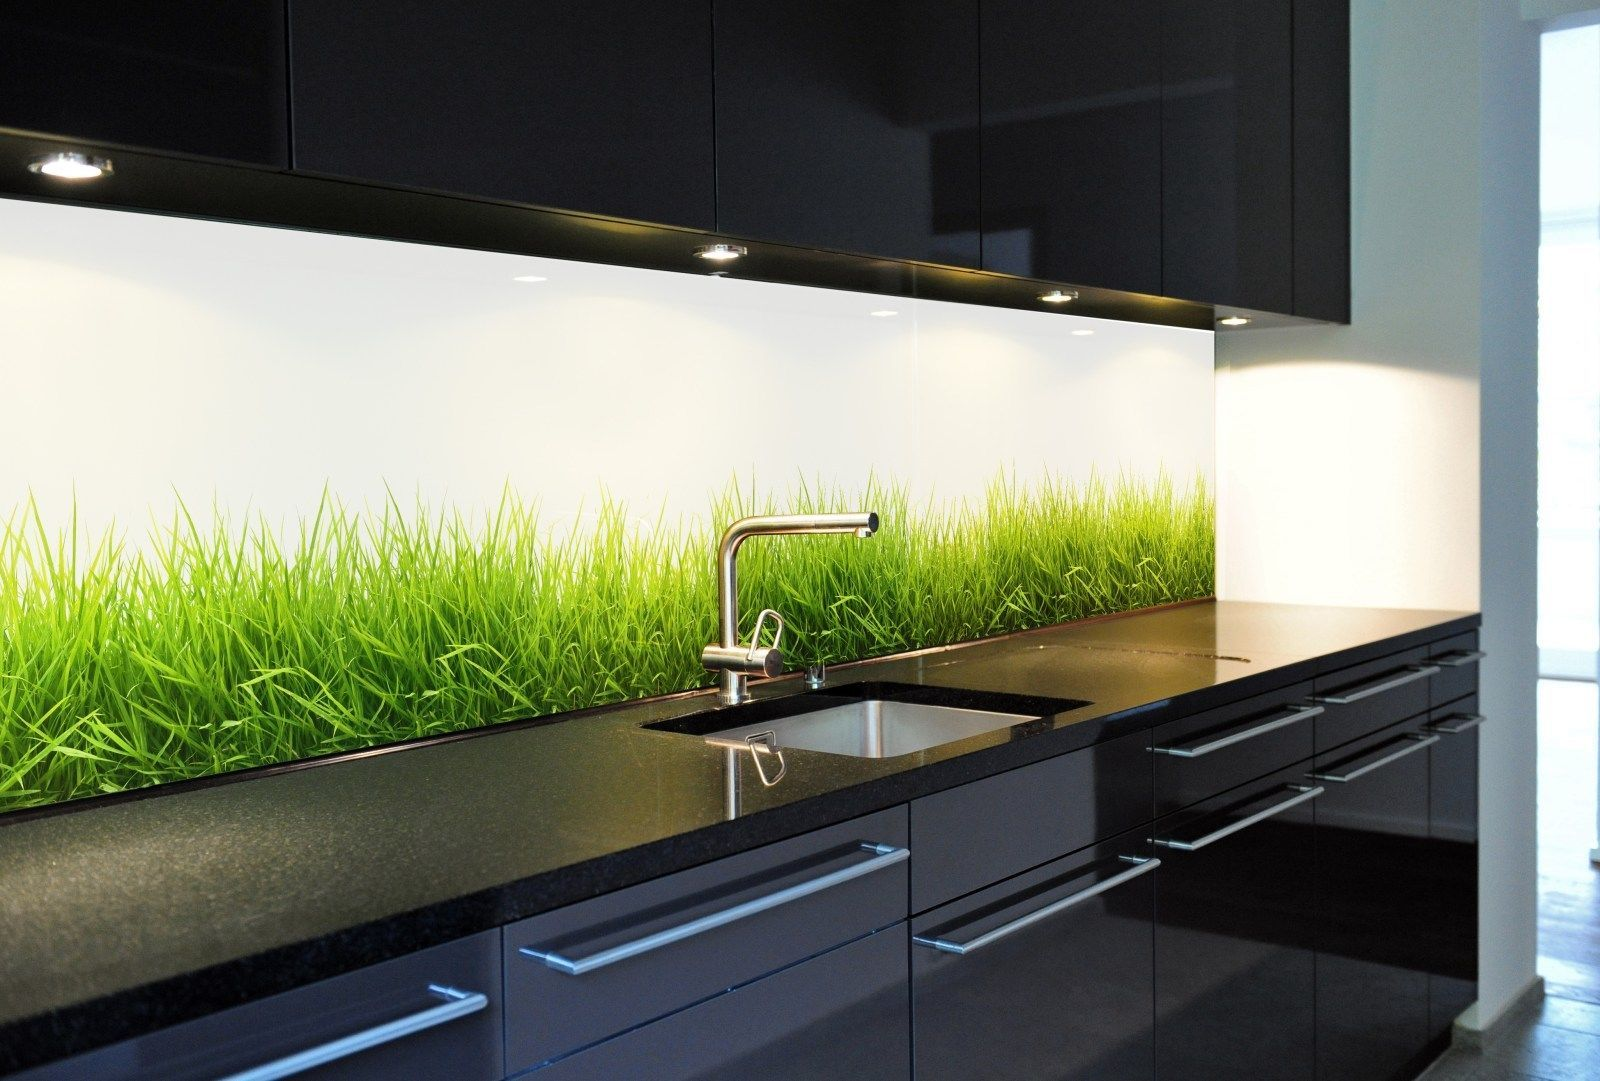 Küchenrückwand aus Glas, Motiv Gras, endlos verlegbar, keine Folie ...